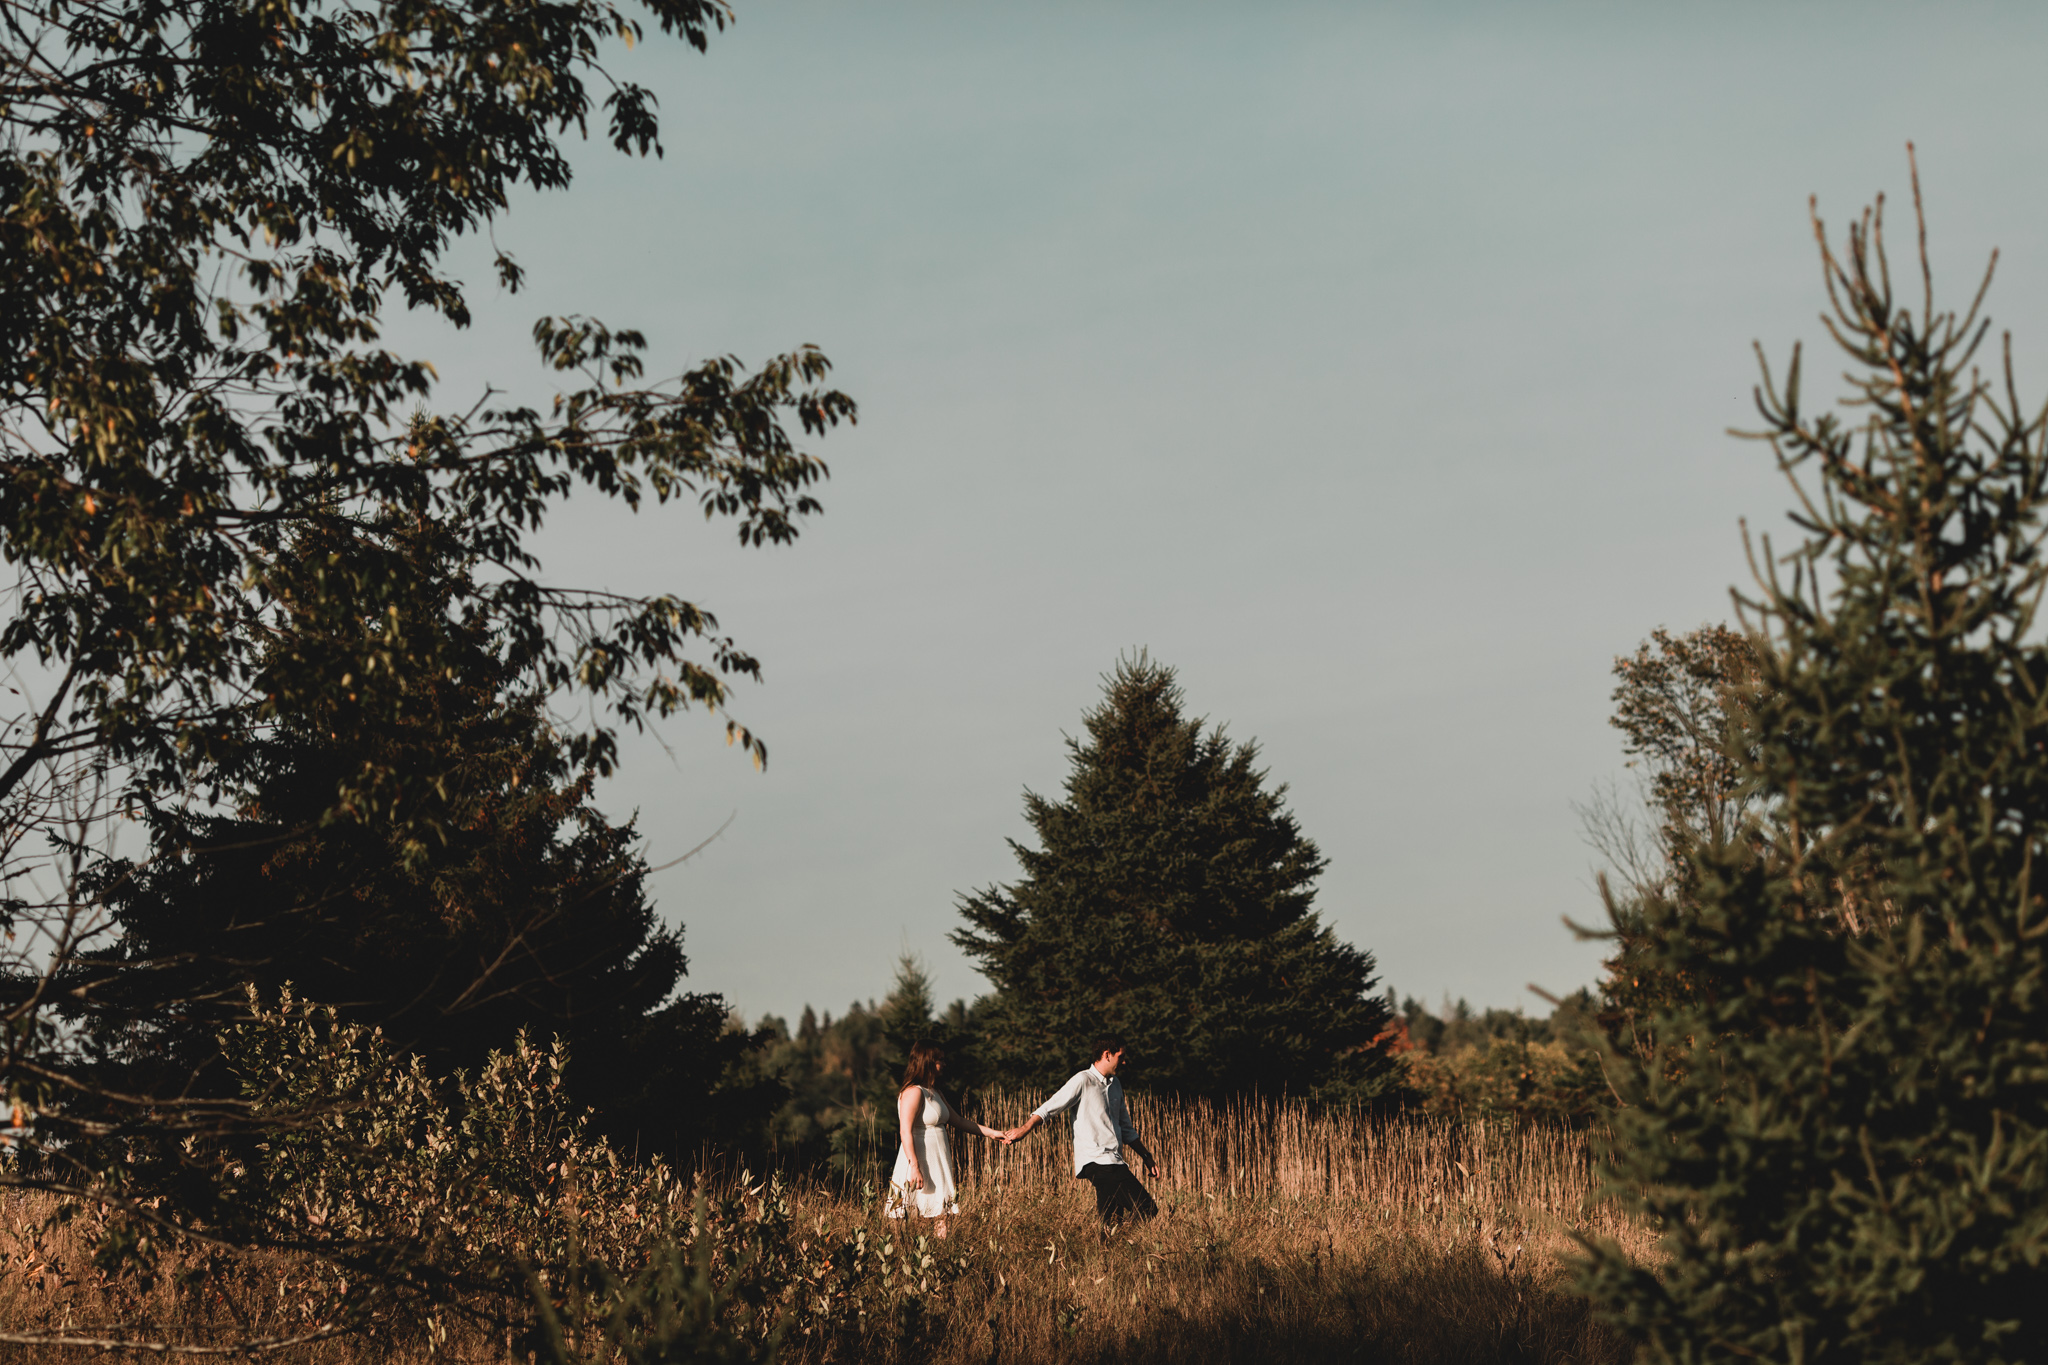 018-WEB-Jonathan-Kuhn-Photography-Rebecca-Emil-Engagement-4473.jpg